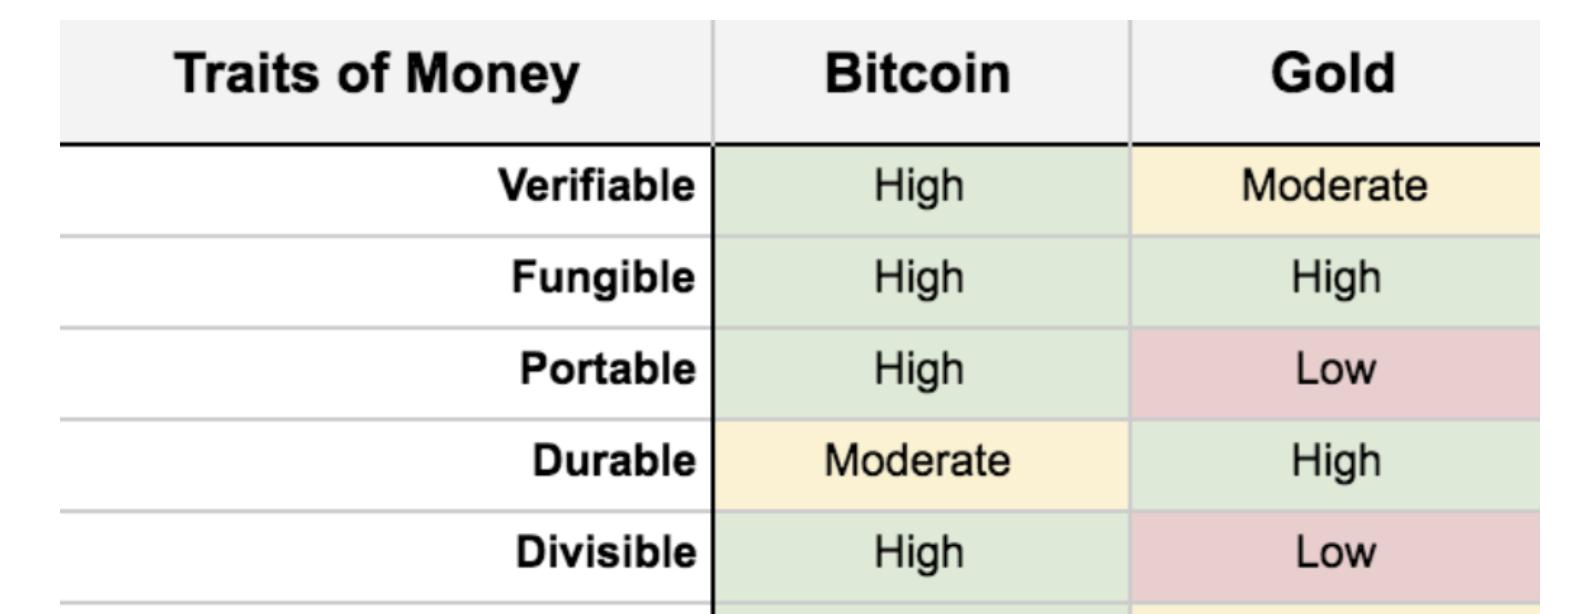 Bitcoin and gold similarities